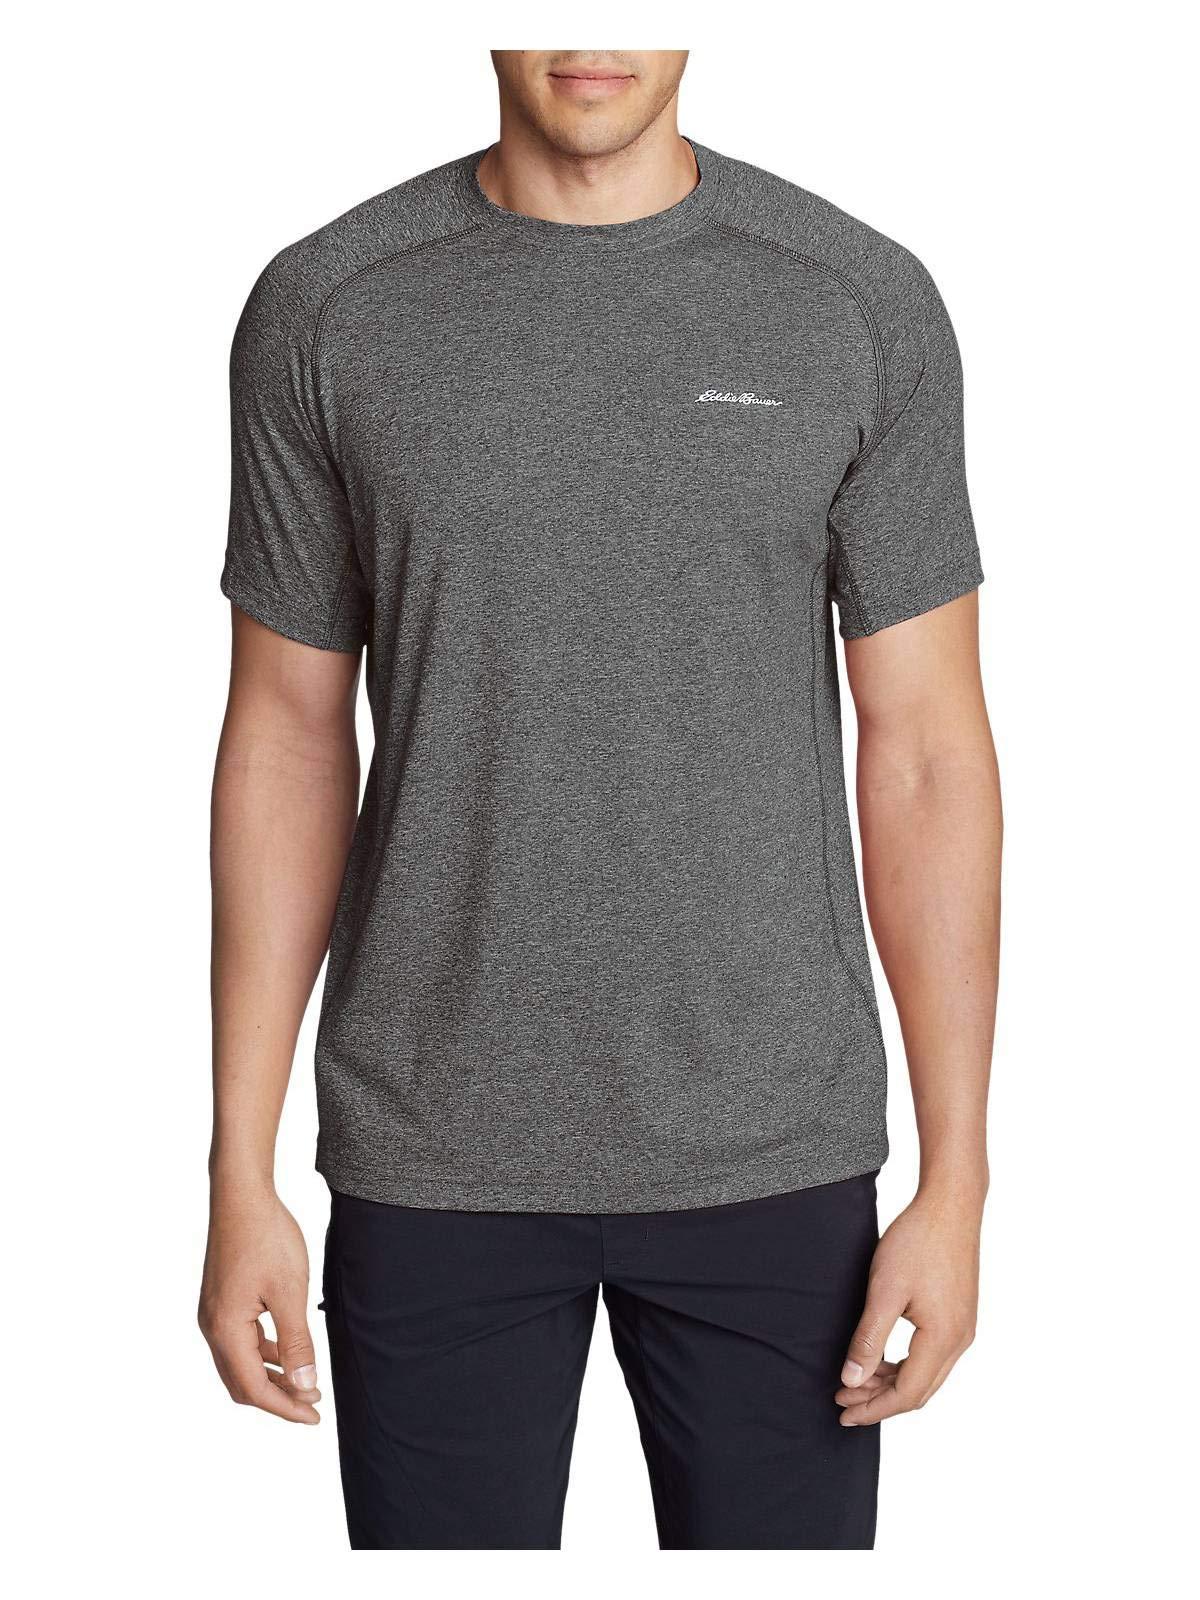 Eddie Bauer Men's Resolution Short-Sleeve T-Shirt, Charcoal HTR Regular S